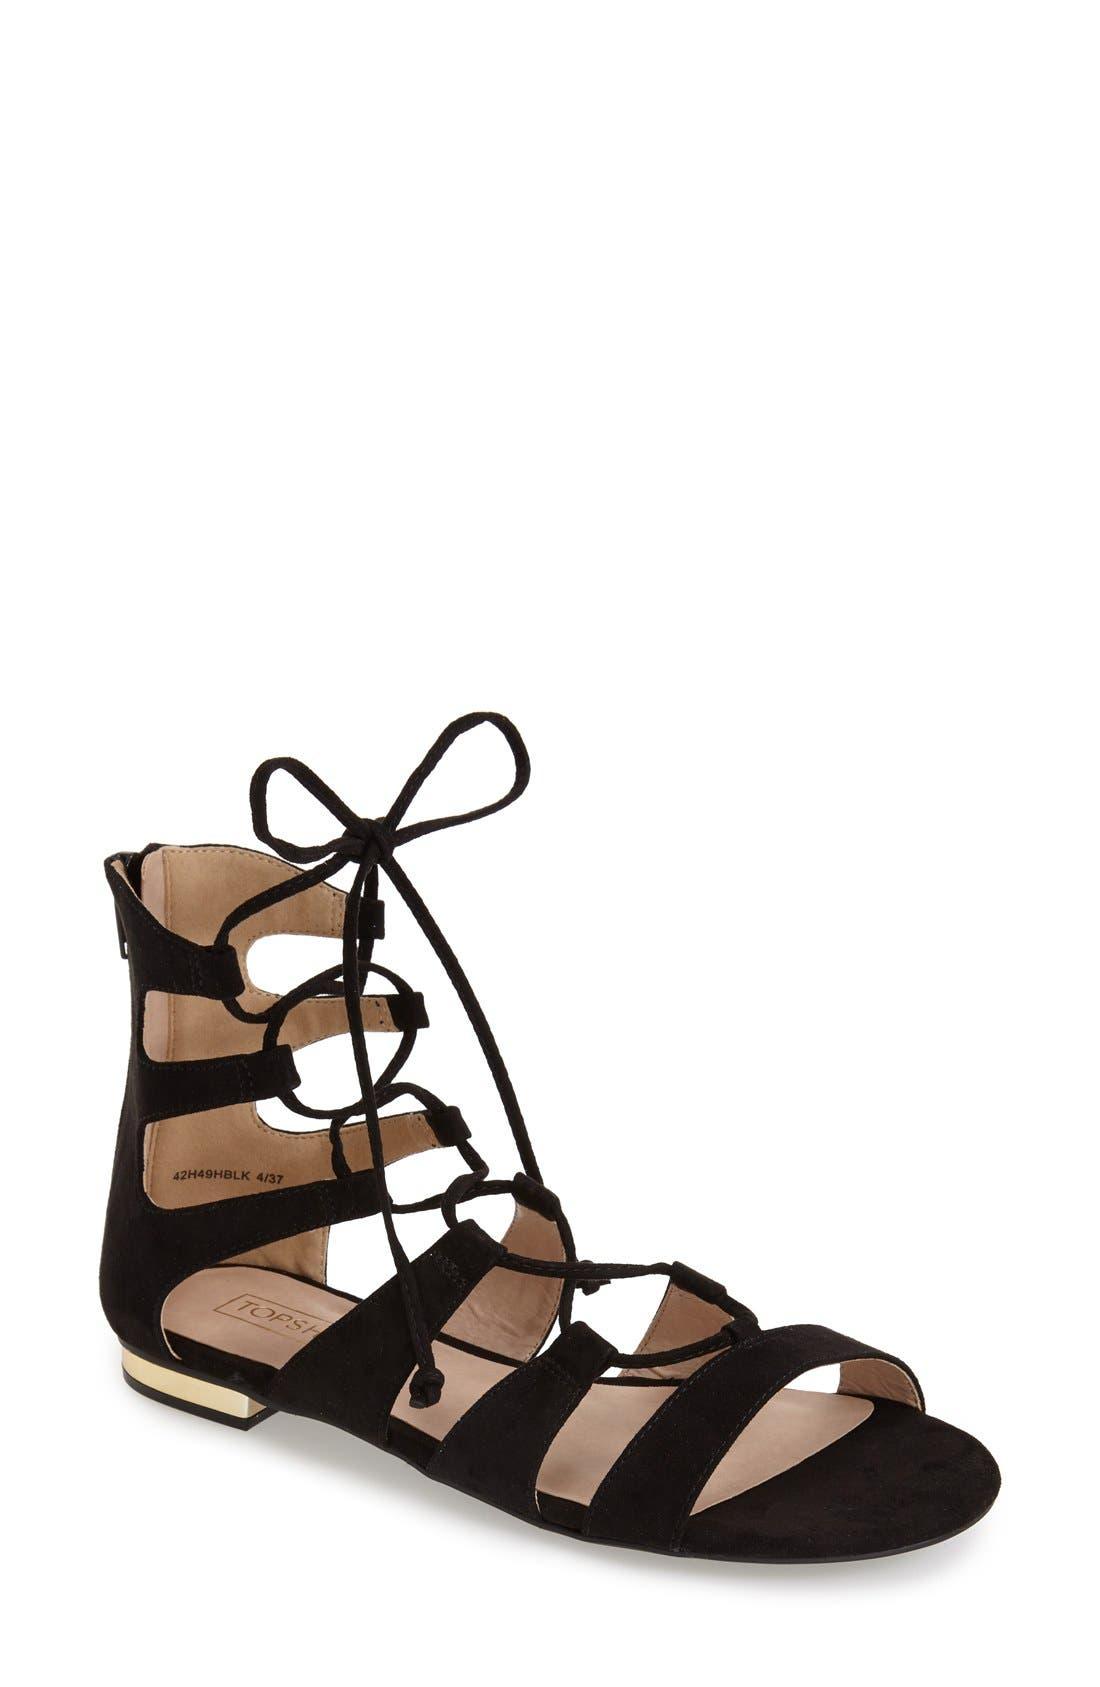 Main Image - Topshop Lace-Up Gladiator Sandal (Women)